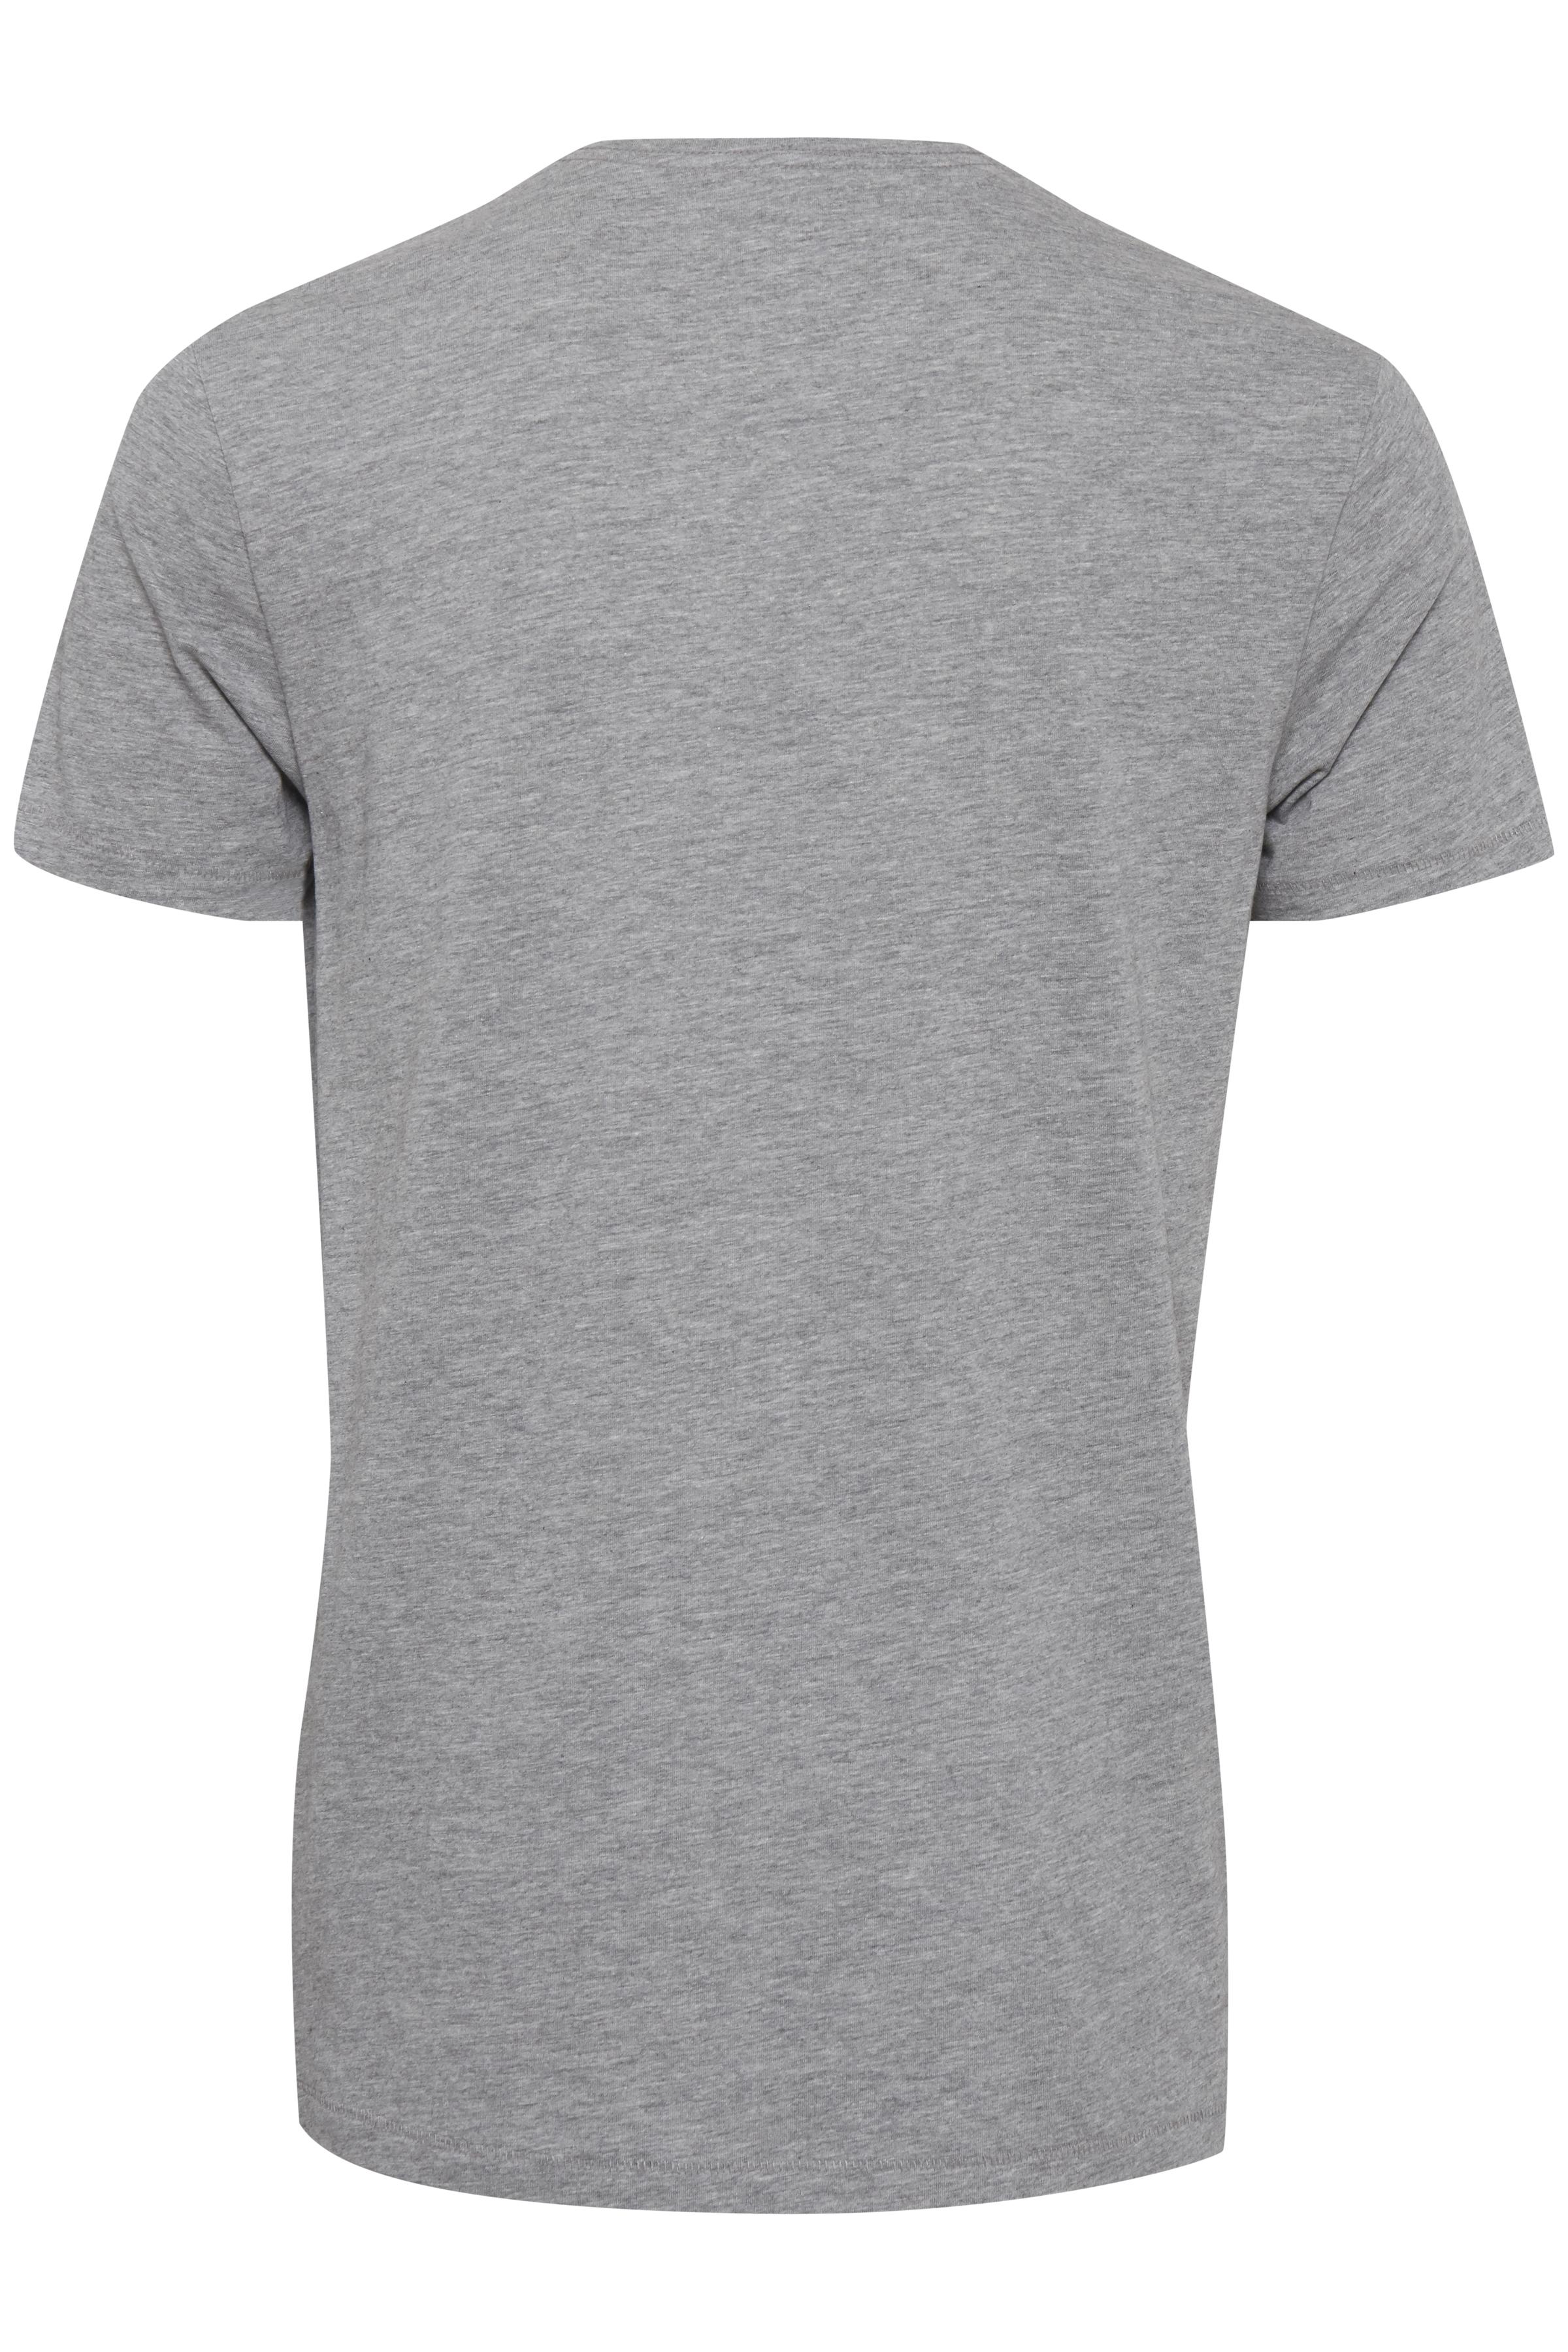 Stone mix T-shirt – Køb Stone mix T-shirt fra str. S-XL her